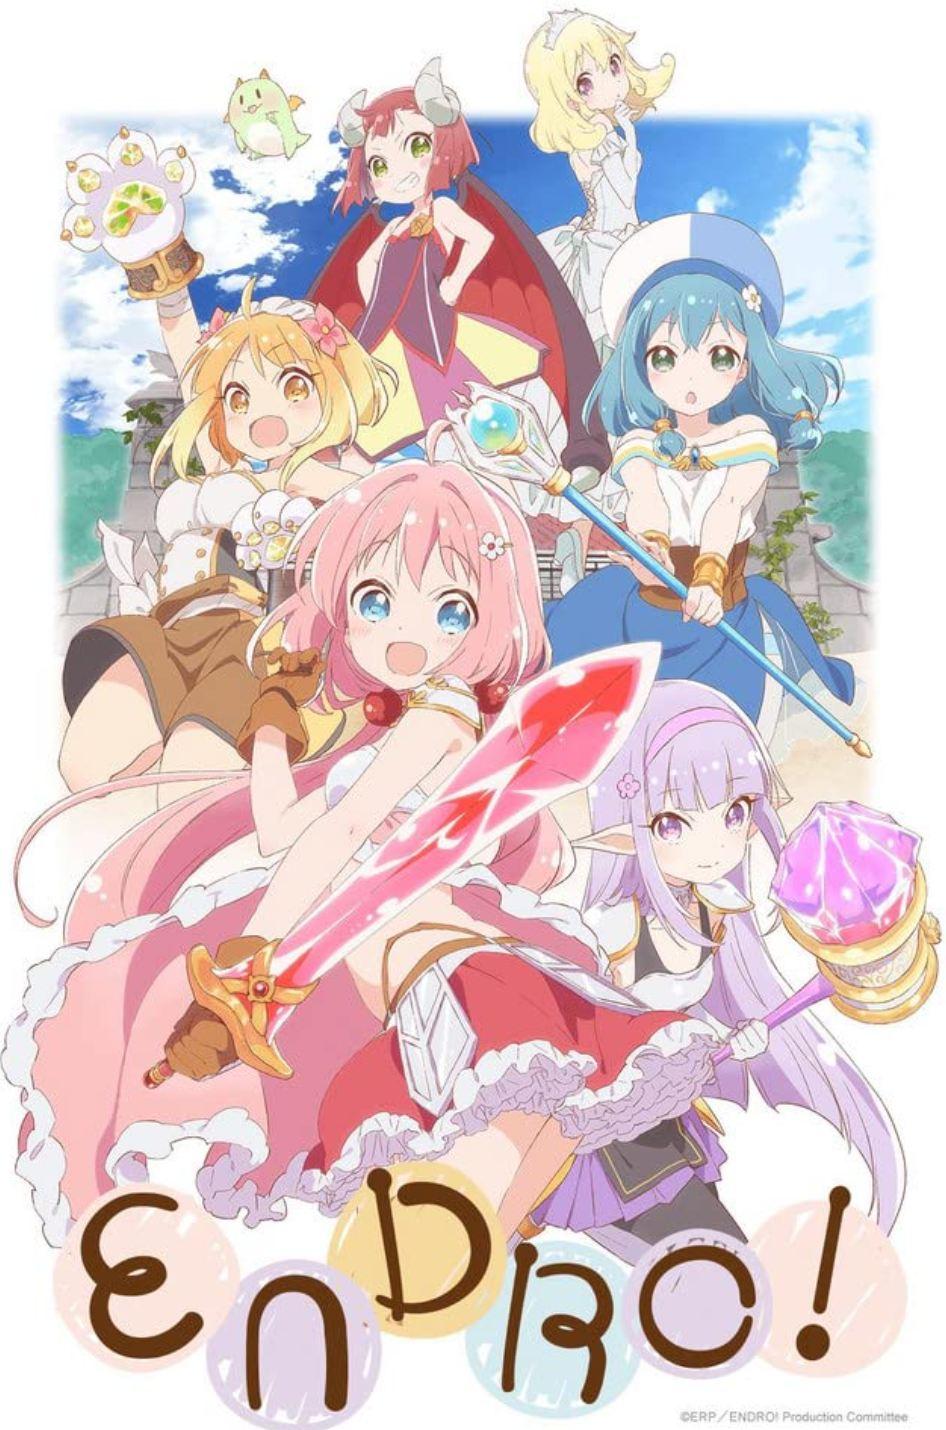 Anime Fantasy Adventure : anime, fantasy, adventure, Fantasy, Anime, Immerse, World, Swords, Sorcery